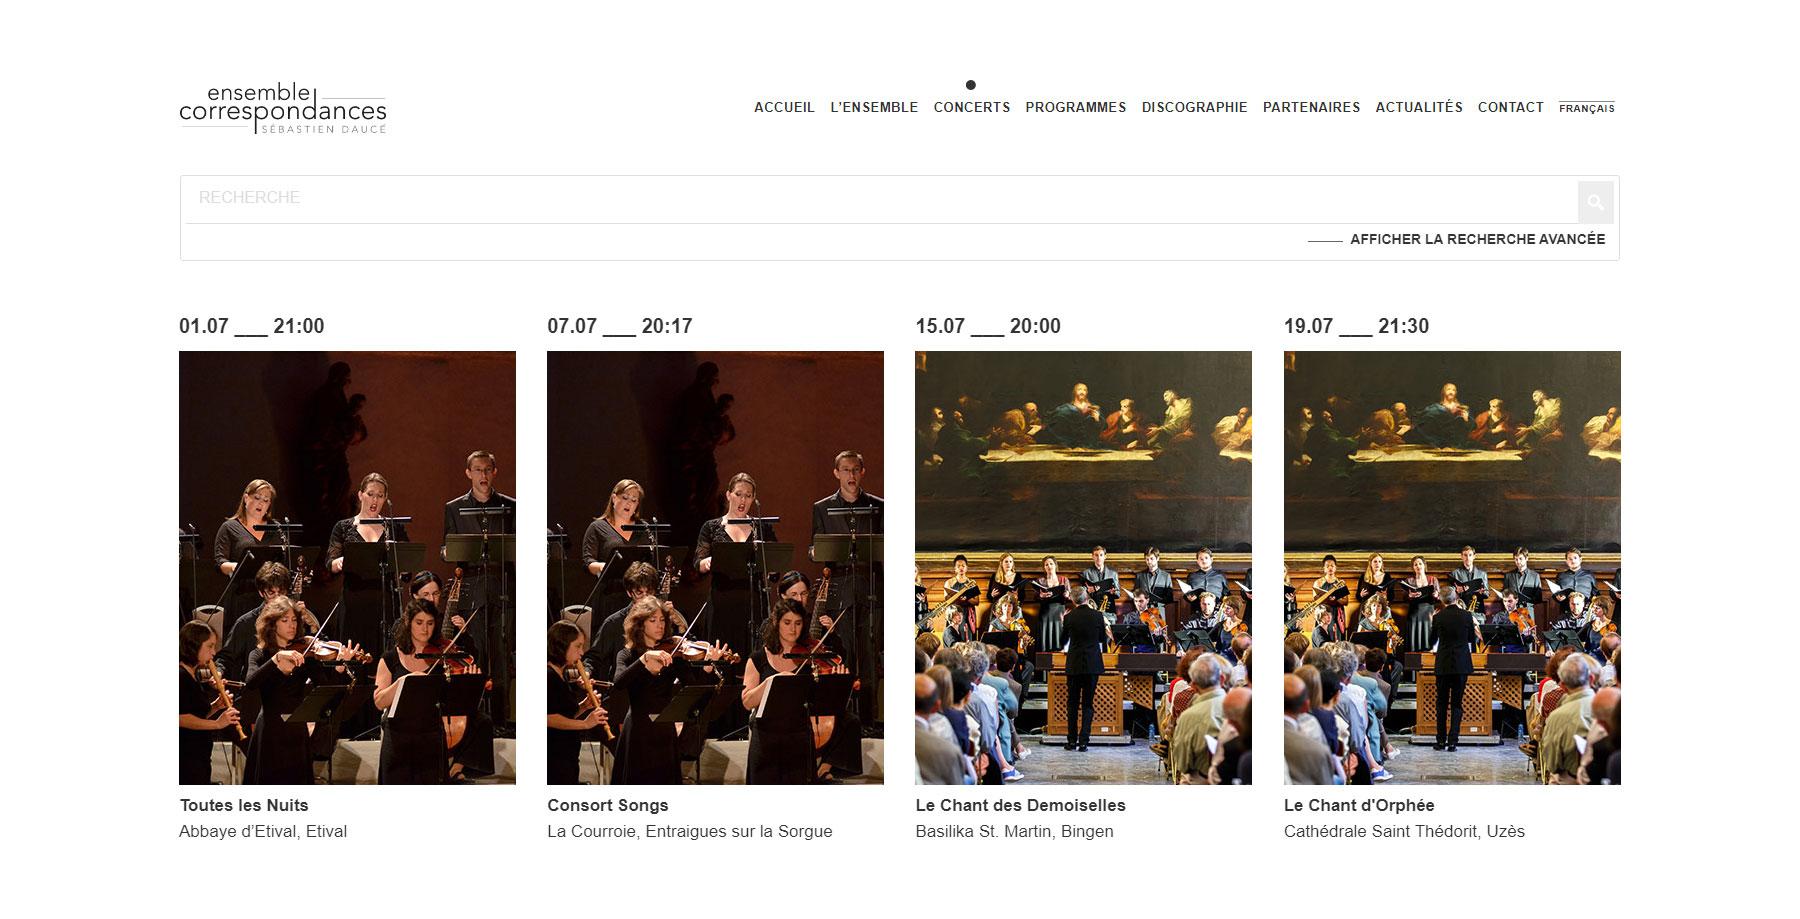 Ensemble Correspondances - Website of the Day